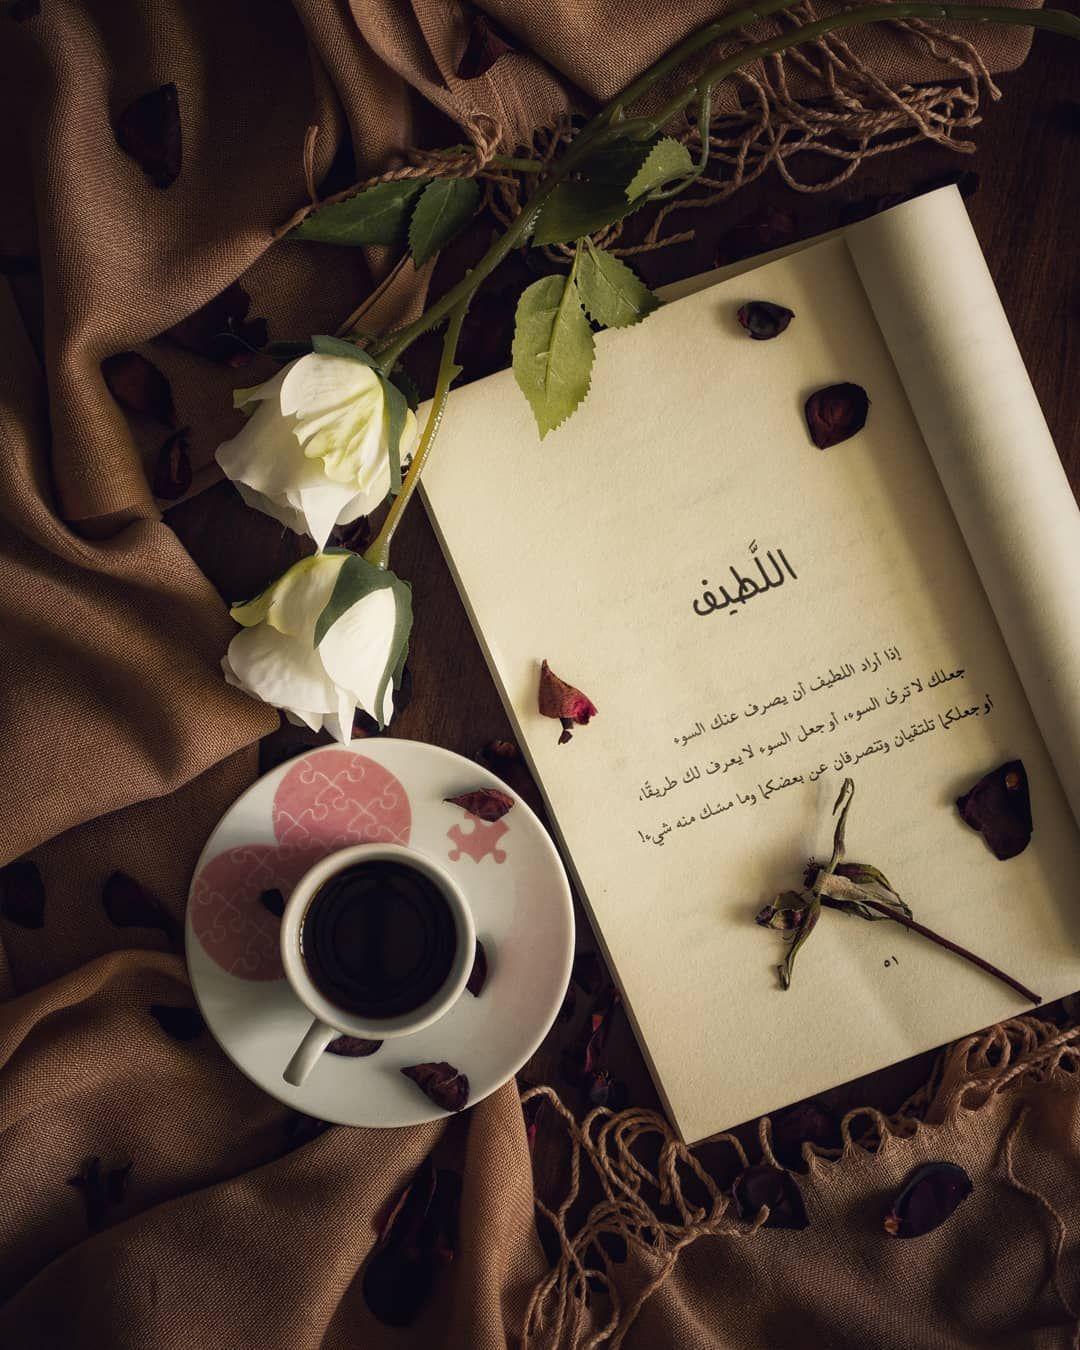 فنجان قهوة و كتاب و ازهار Coffee Book And Flowers C 𝐇𝐢𝐬𝐡𝐚𝐦 𝐘𝐚𝐡𝐲𝐚 Glassware Coffee Tableware